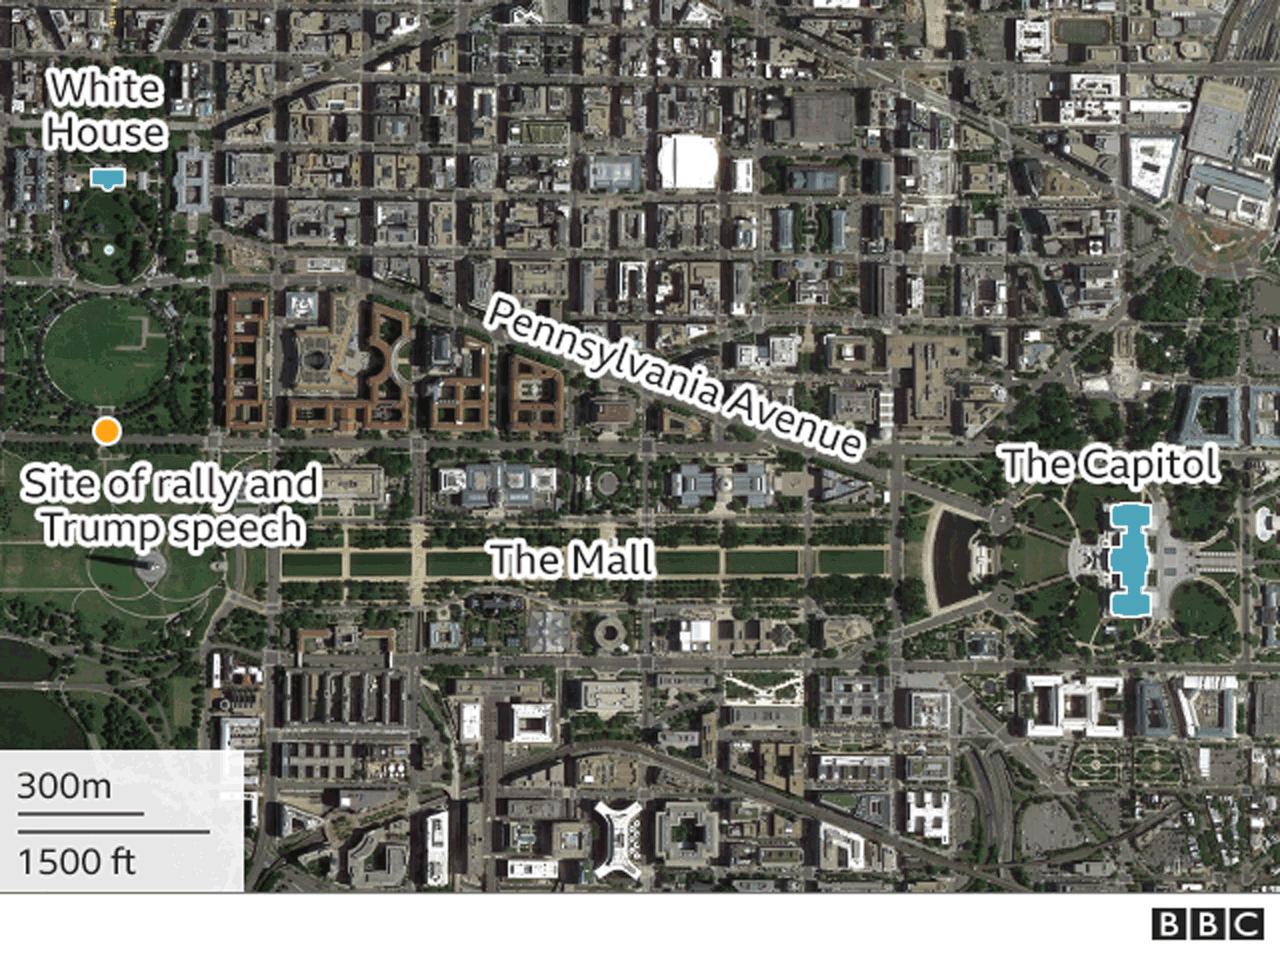 Map of Washington DC locations